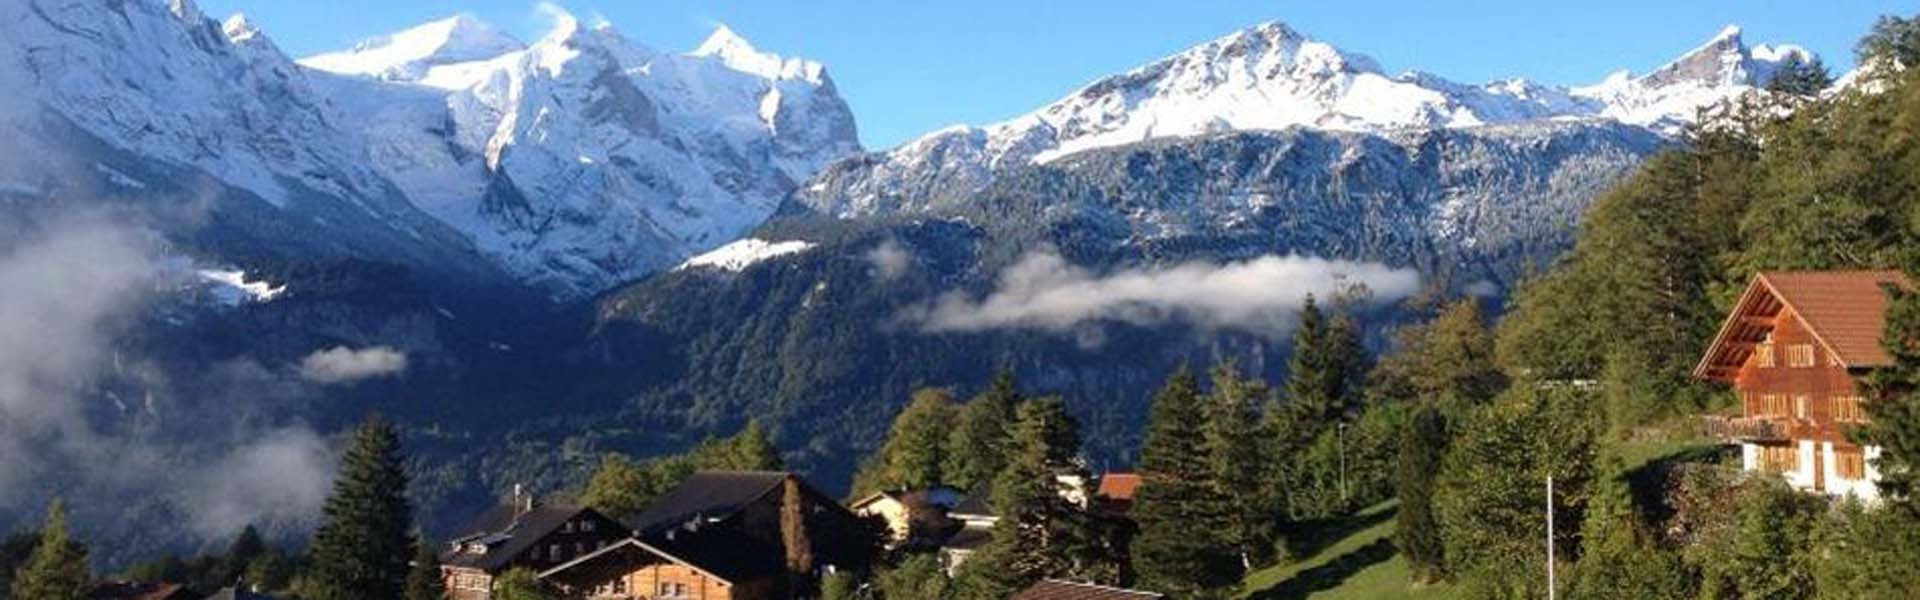 Ecole Humanite Switzerland Mountains Banner 2019